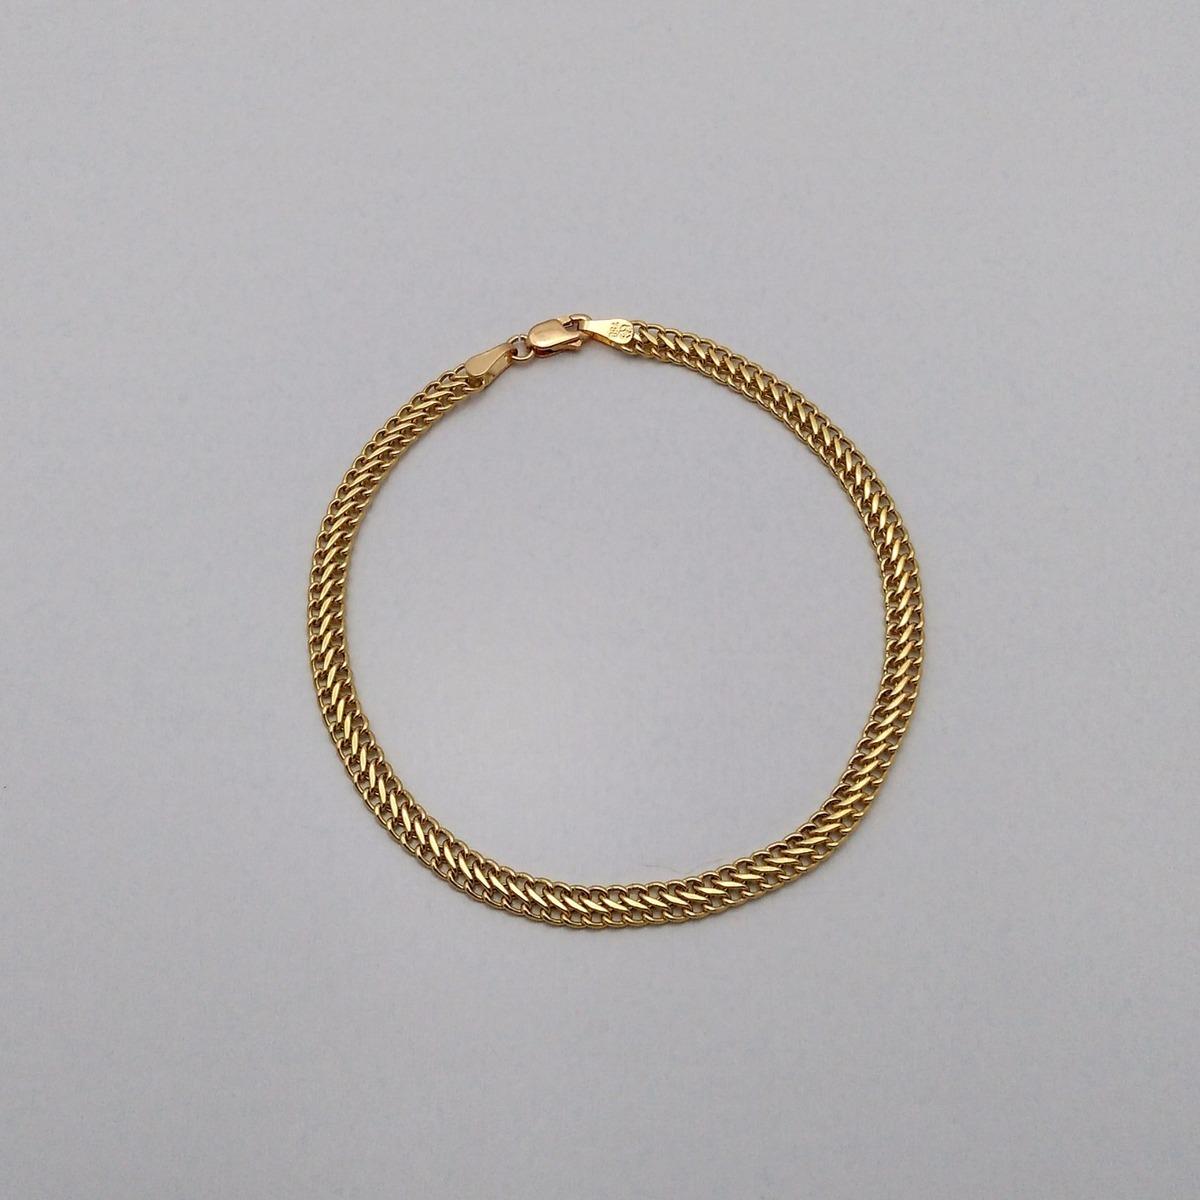 ea076384869 pulseira feminina lacraia em ouro 18k liga 750 frete gratis. Carregando  zoom.